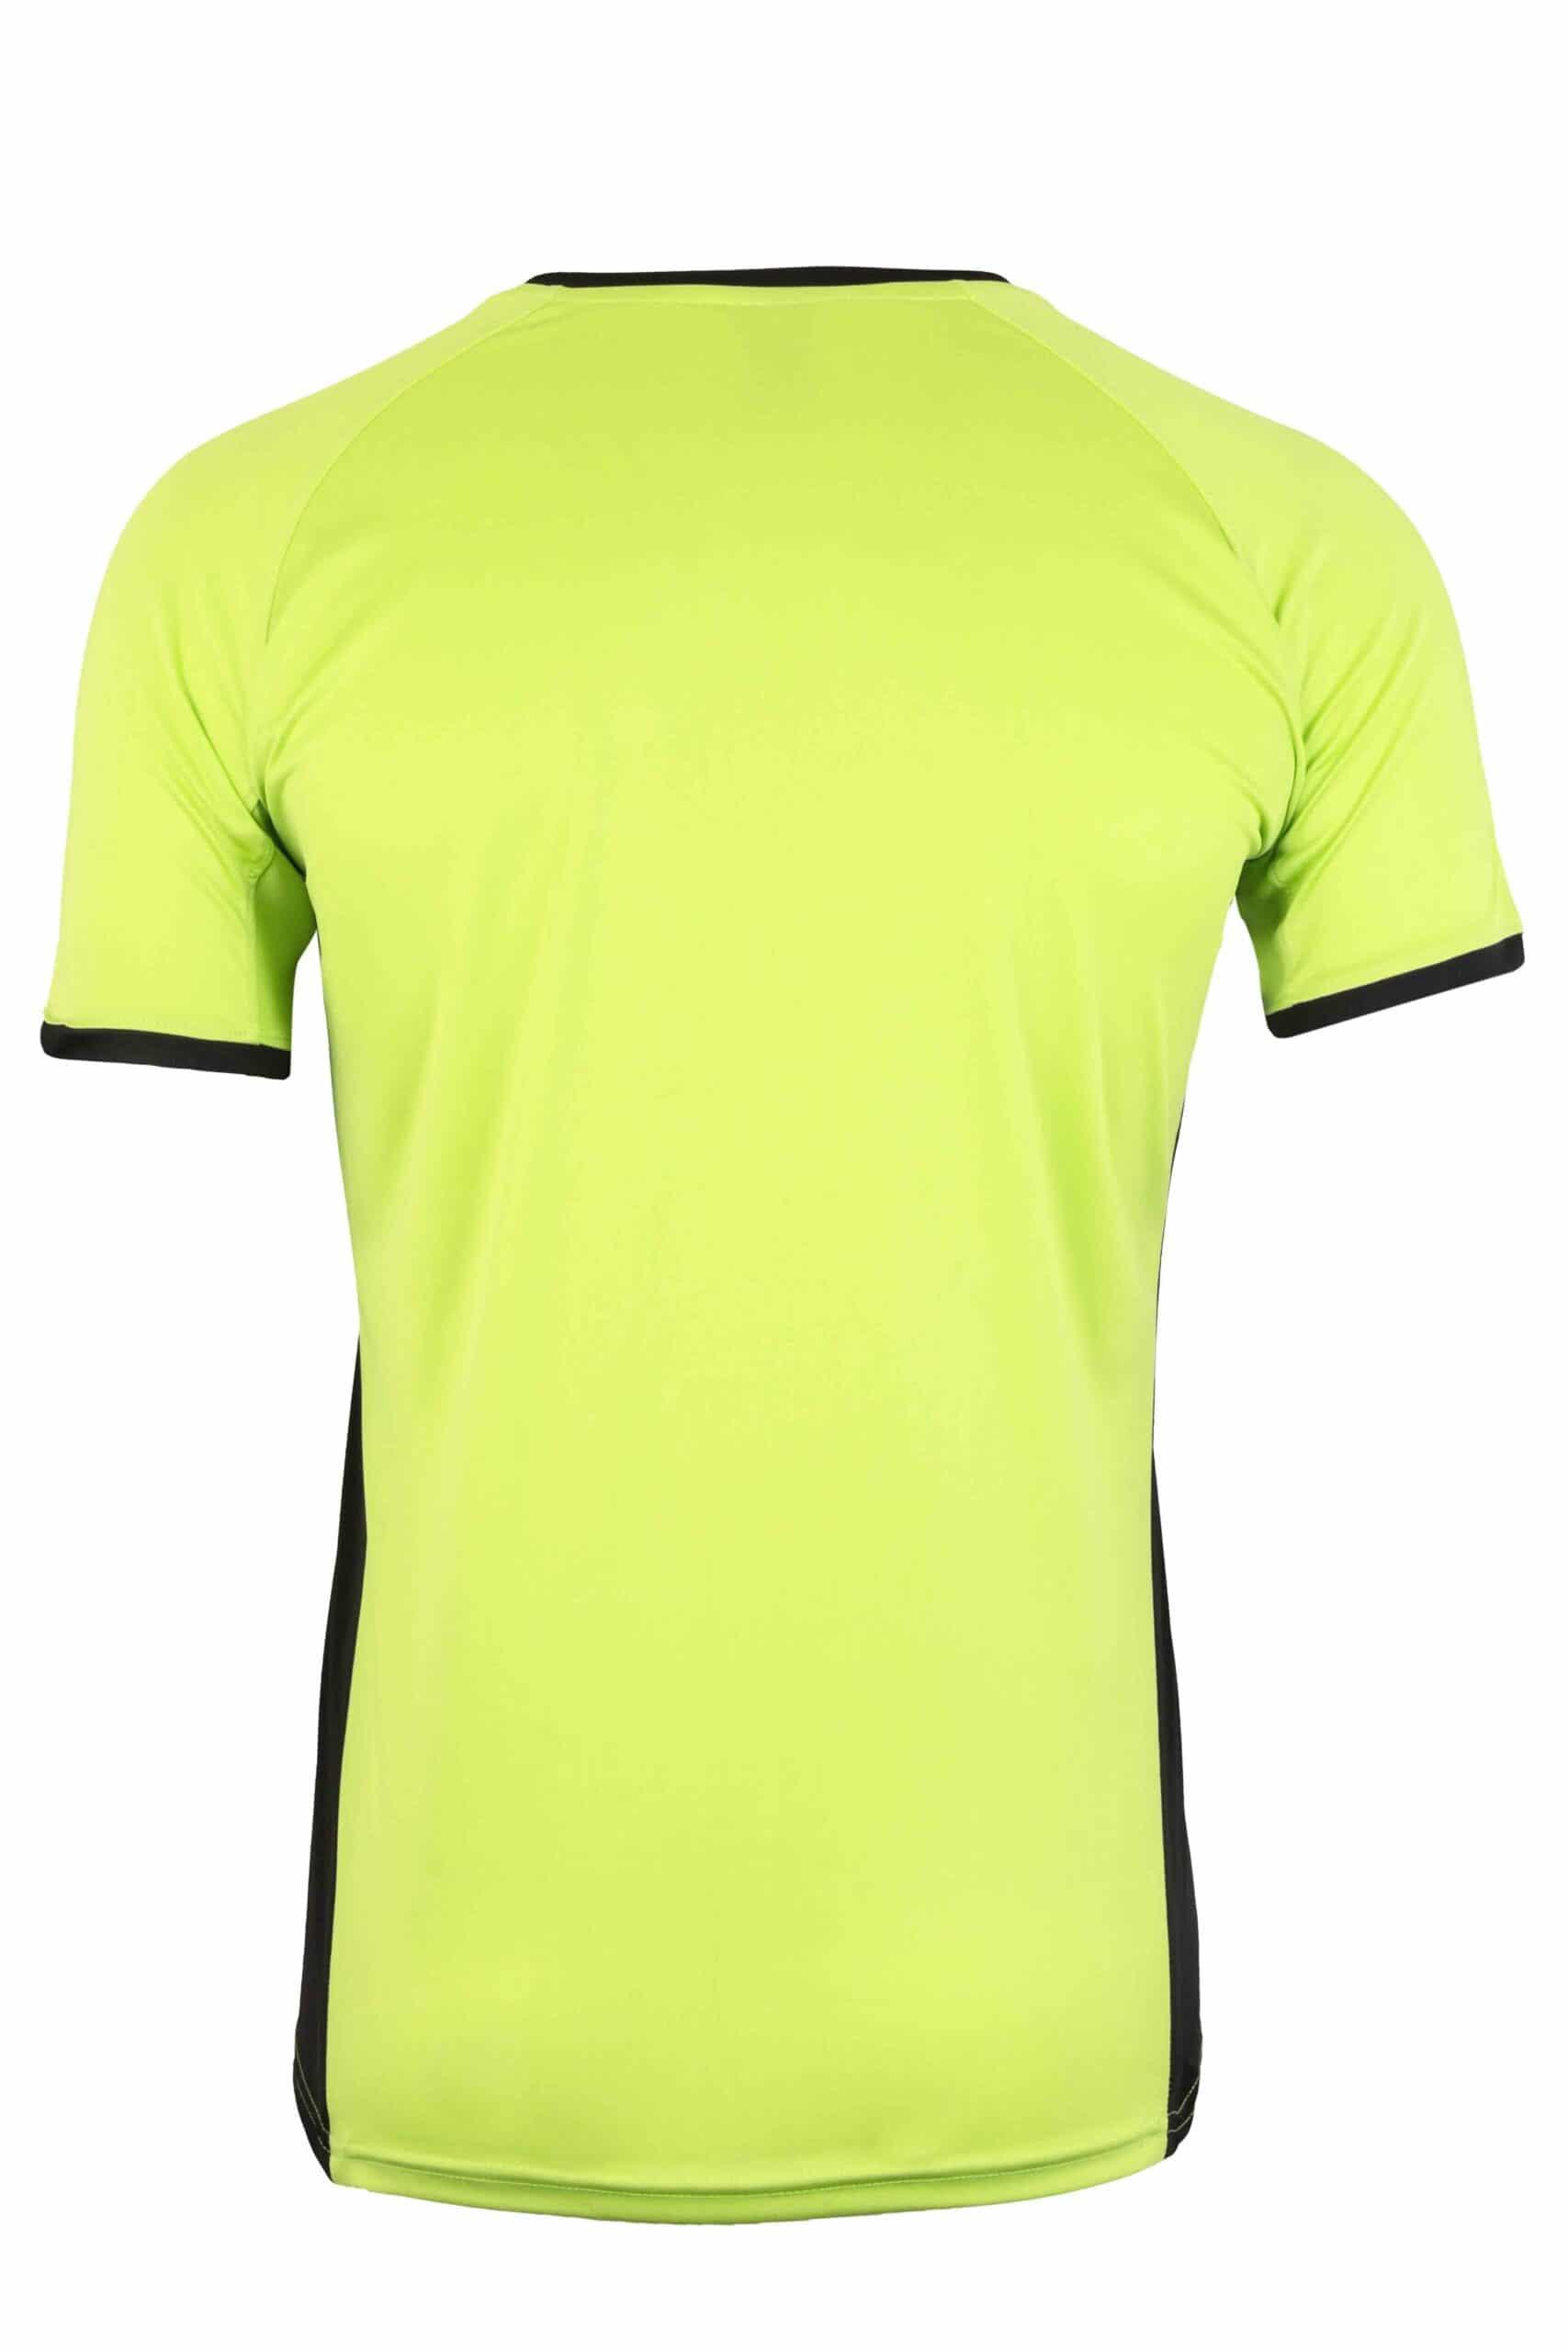 Mukua Mk530v Mukua Camiseta TÉcnica Manga Corta Bicolor Lime Blak 2